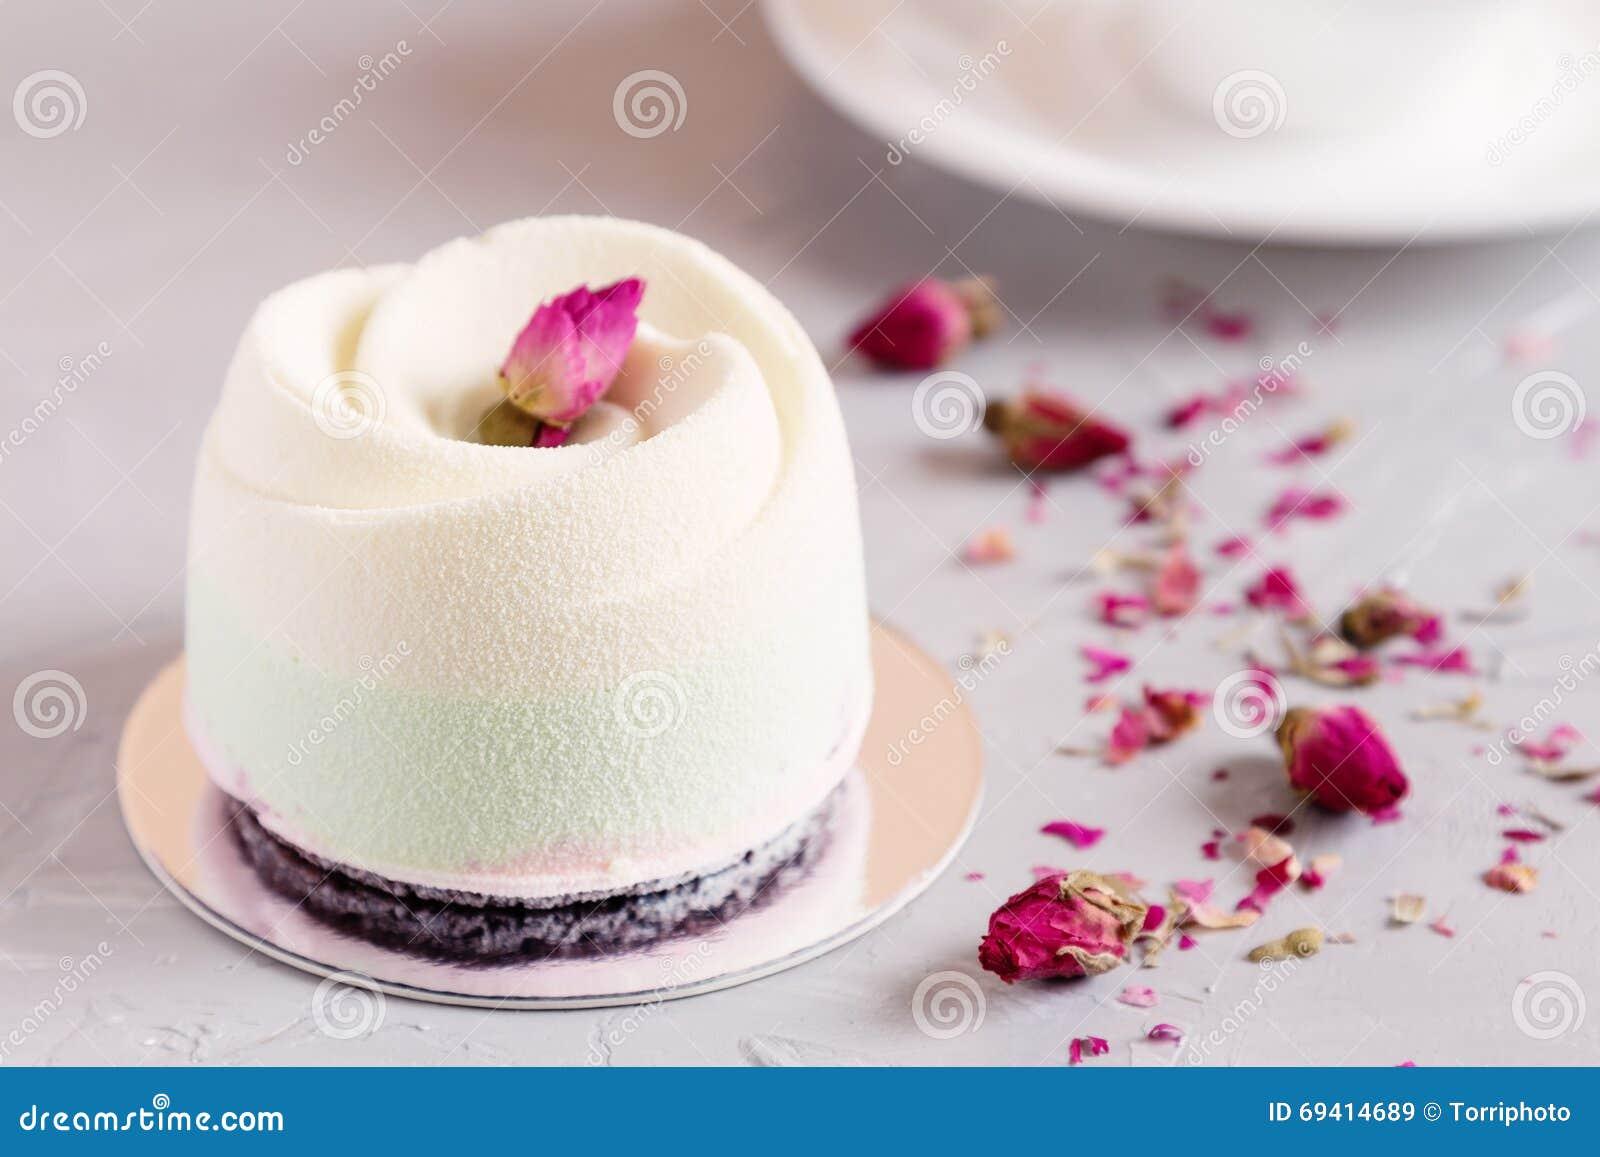 Rose Mousse Cake